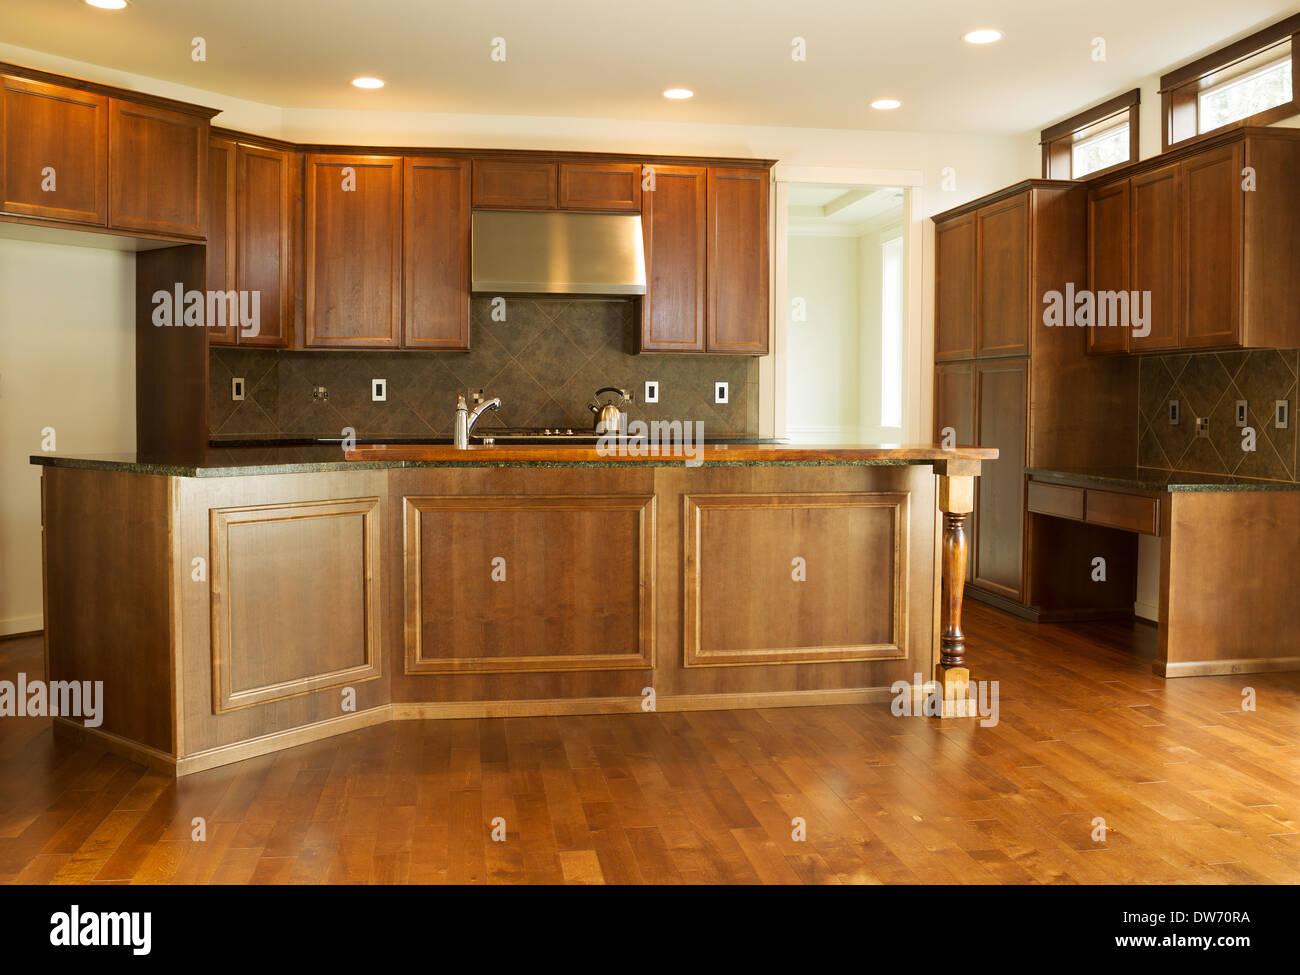 Cucina Con Finestra Orizzontale armadi da cucina immagini & armadi da cucina fotos stock - alamy